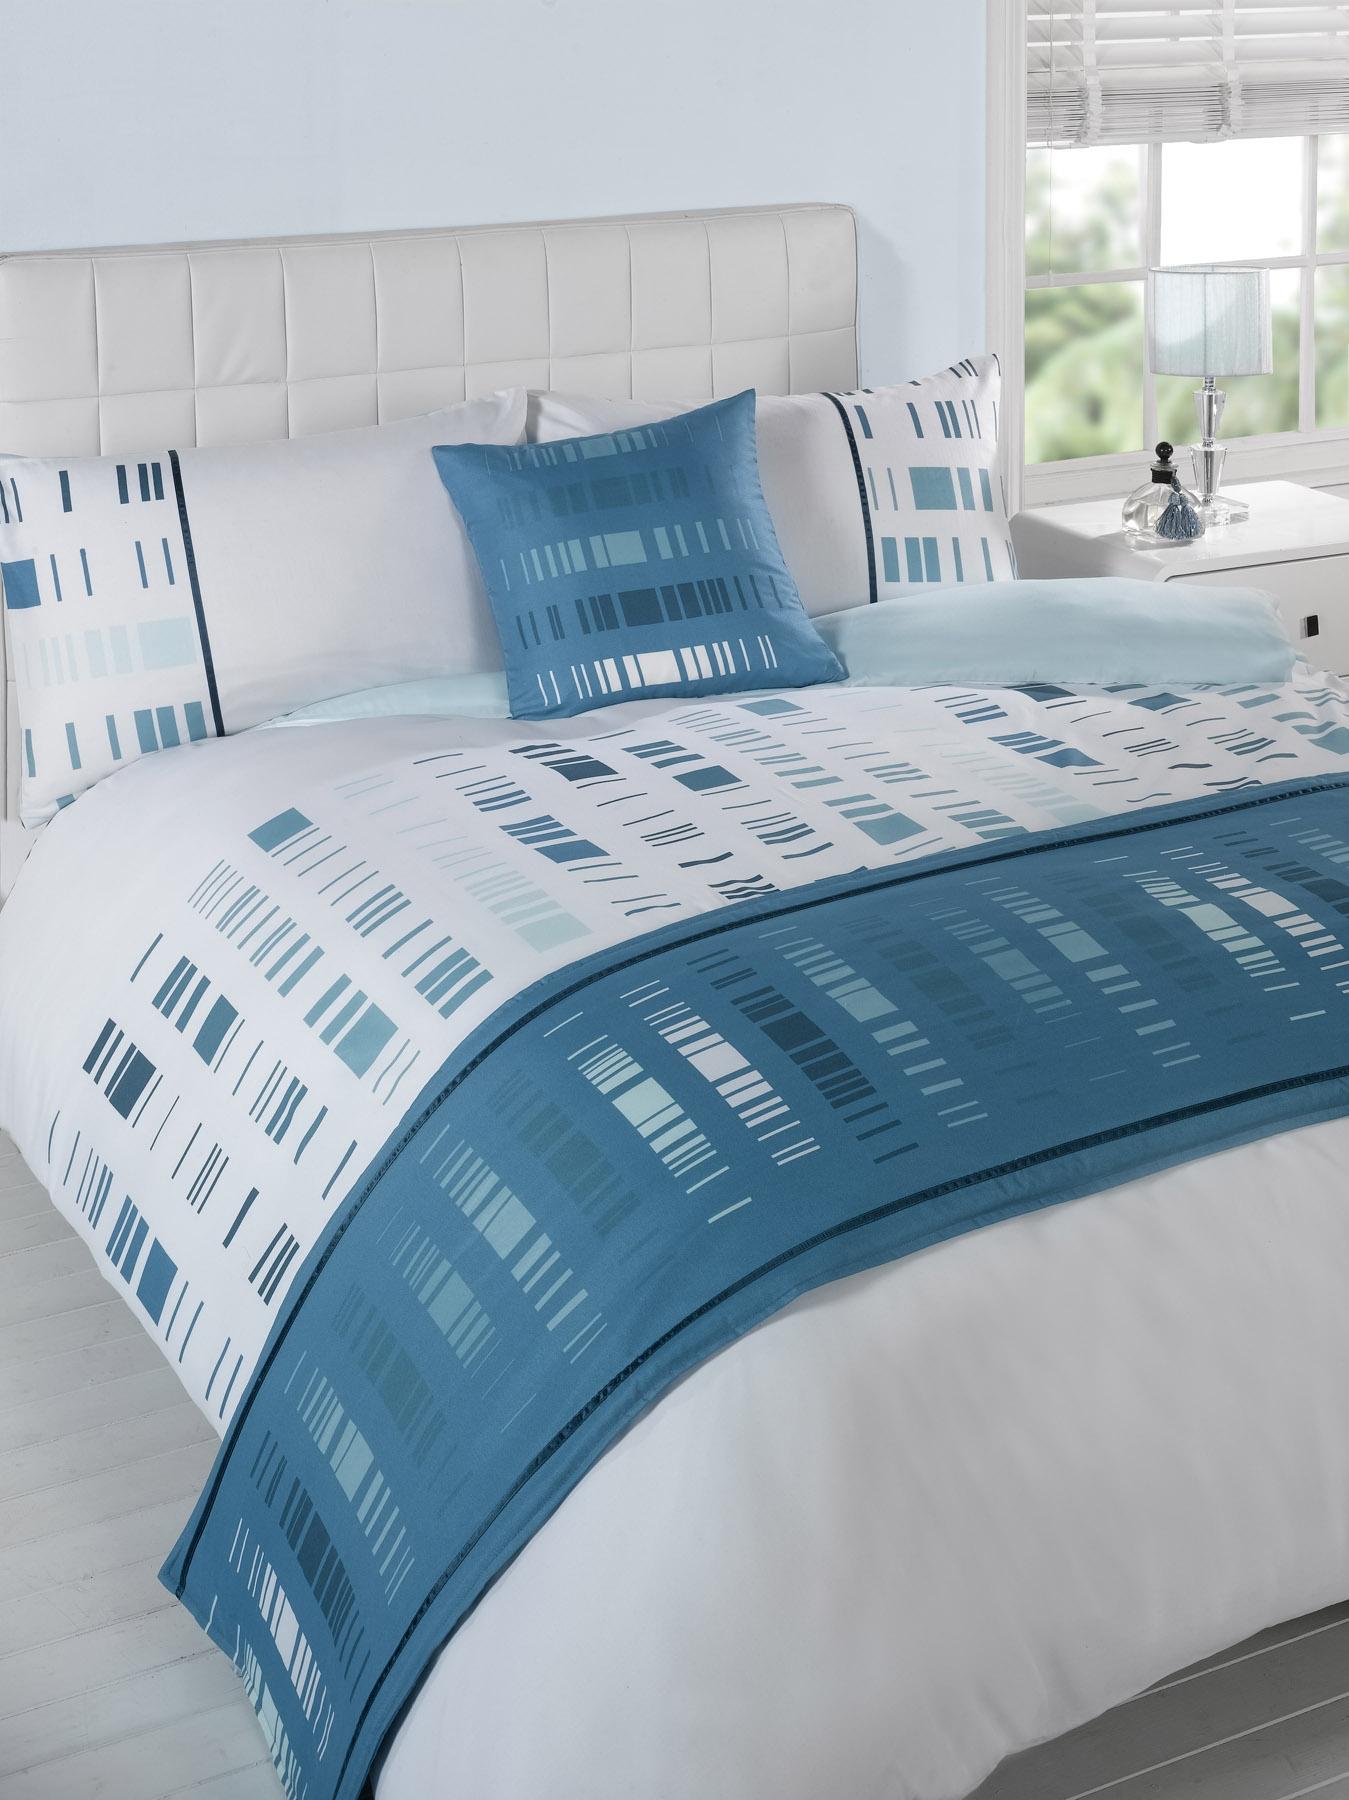 stepp bettdecke bettw sche bed in a bag t rkis einzelbett doppelbett kingsize ebay. Black Bedroom Furniture Sets. Home Design Ideas